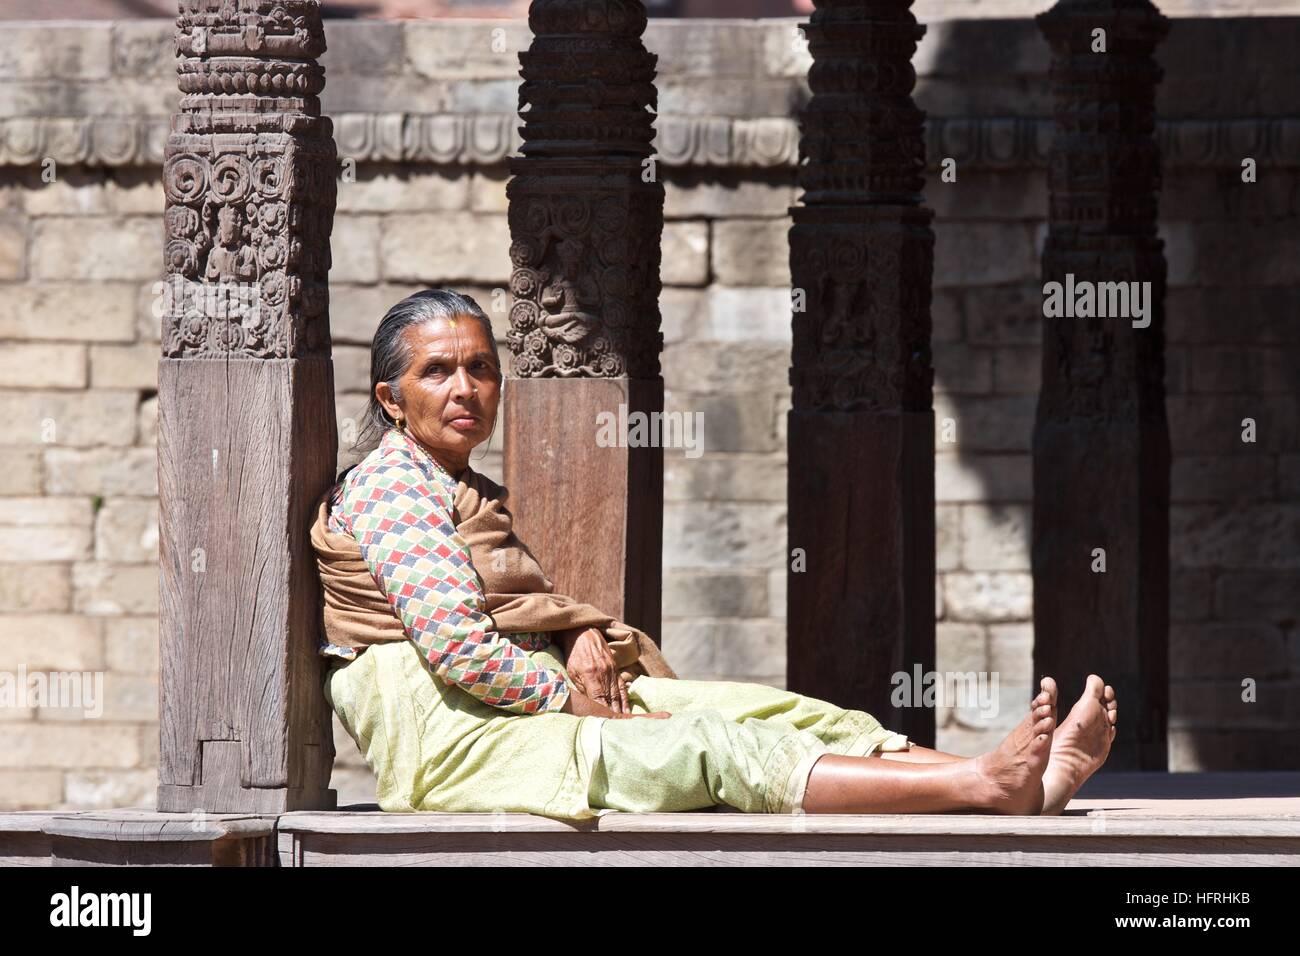 Nepal Kathmandu Asia local woman lady street candid sitting wooden columns - Stock Image